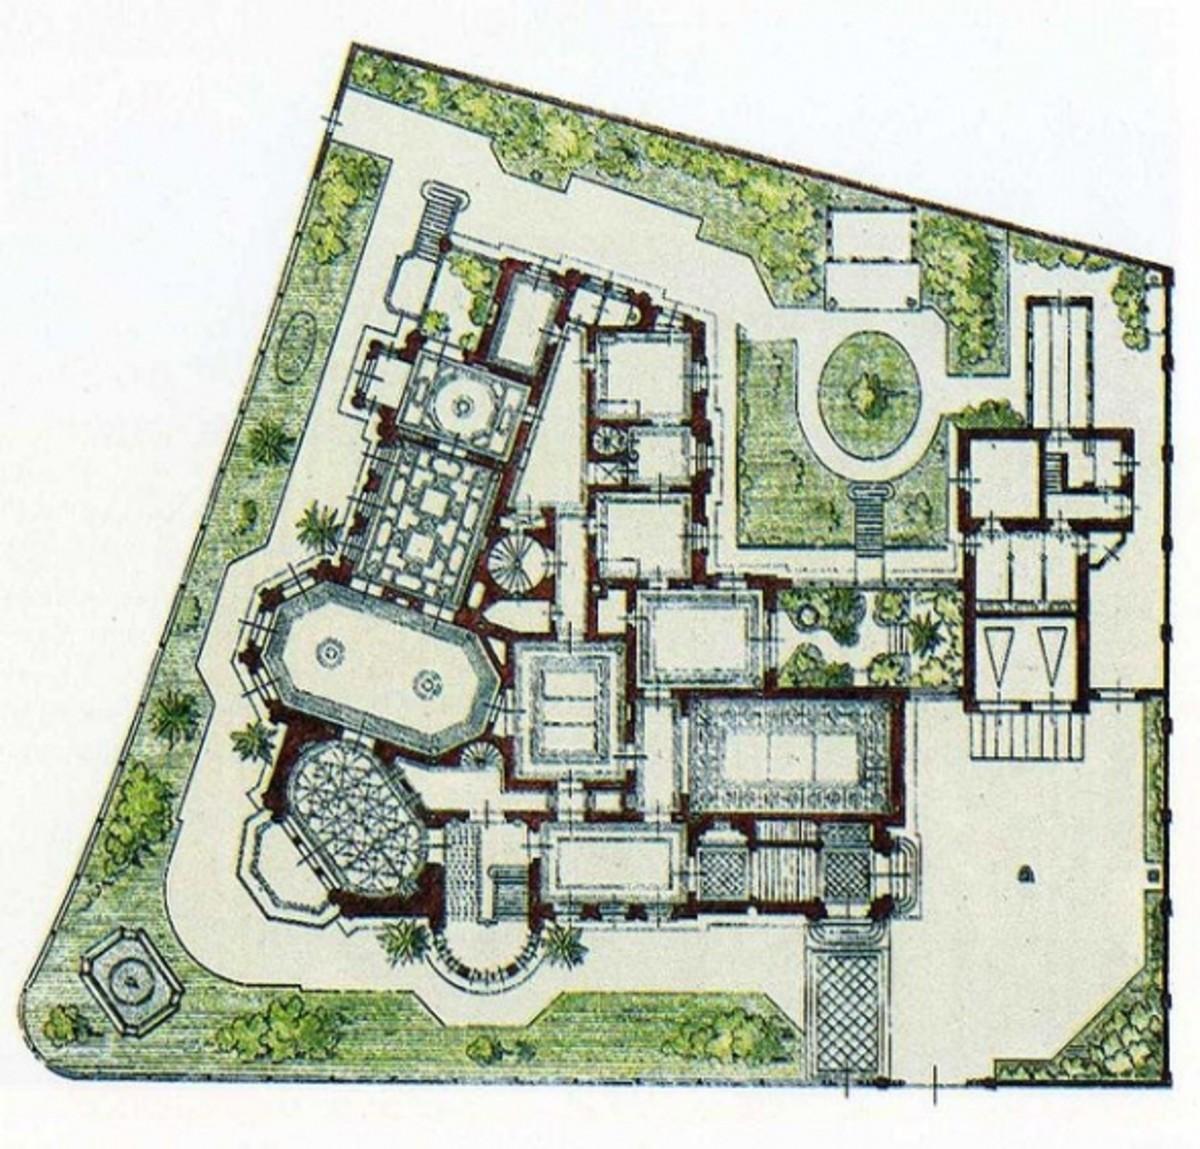 Original drawing by Russian Architect Harald Julius von Bosse